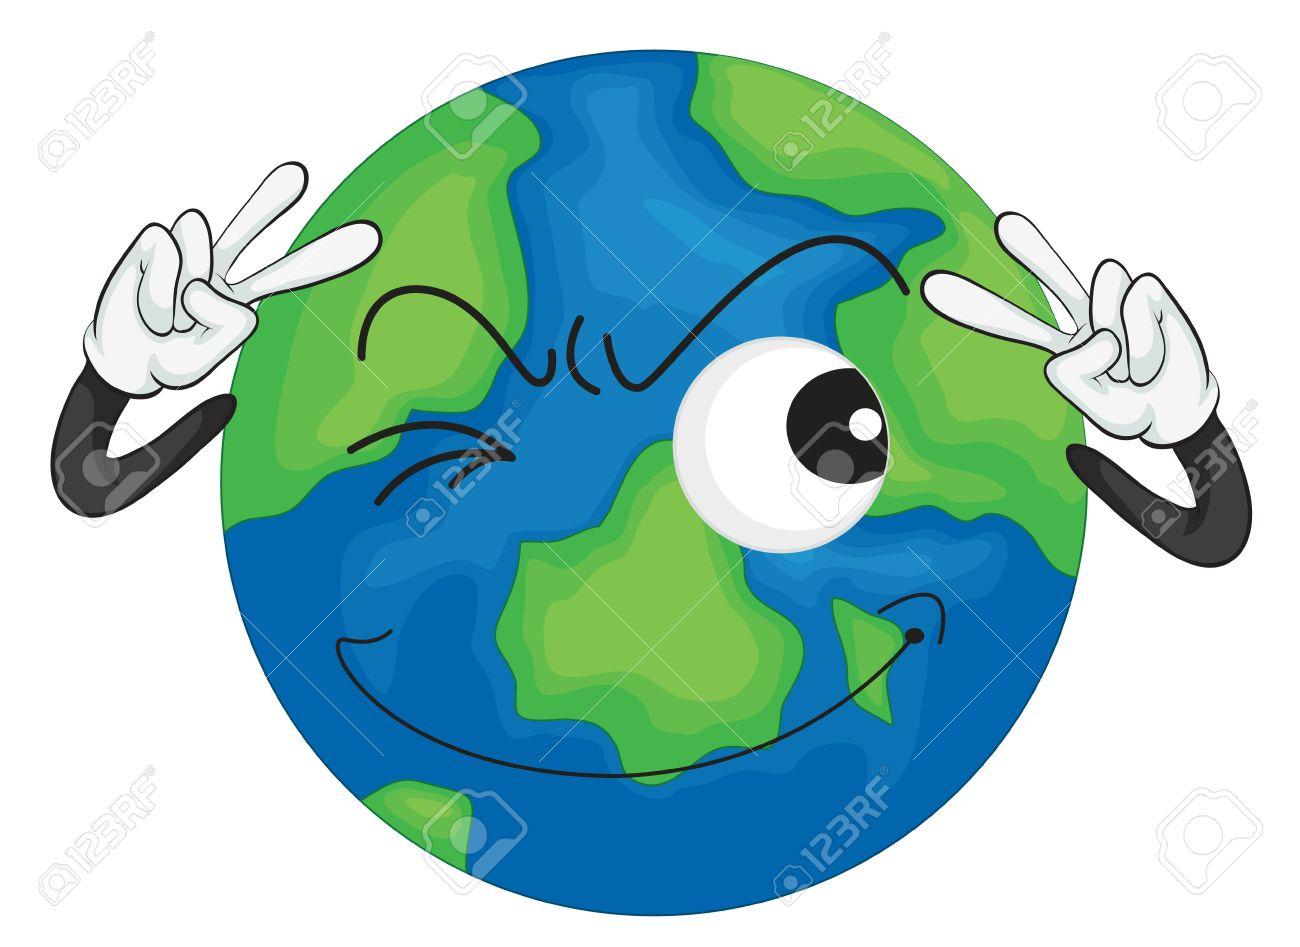 Earth Cartoon Drawing At GetDrawings.com